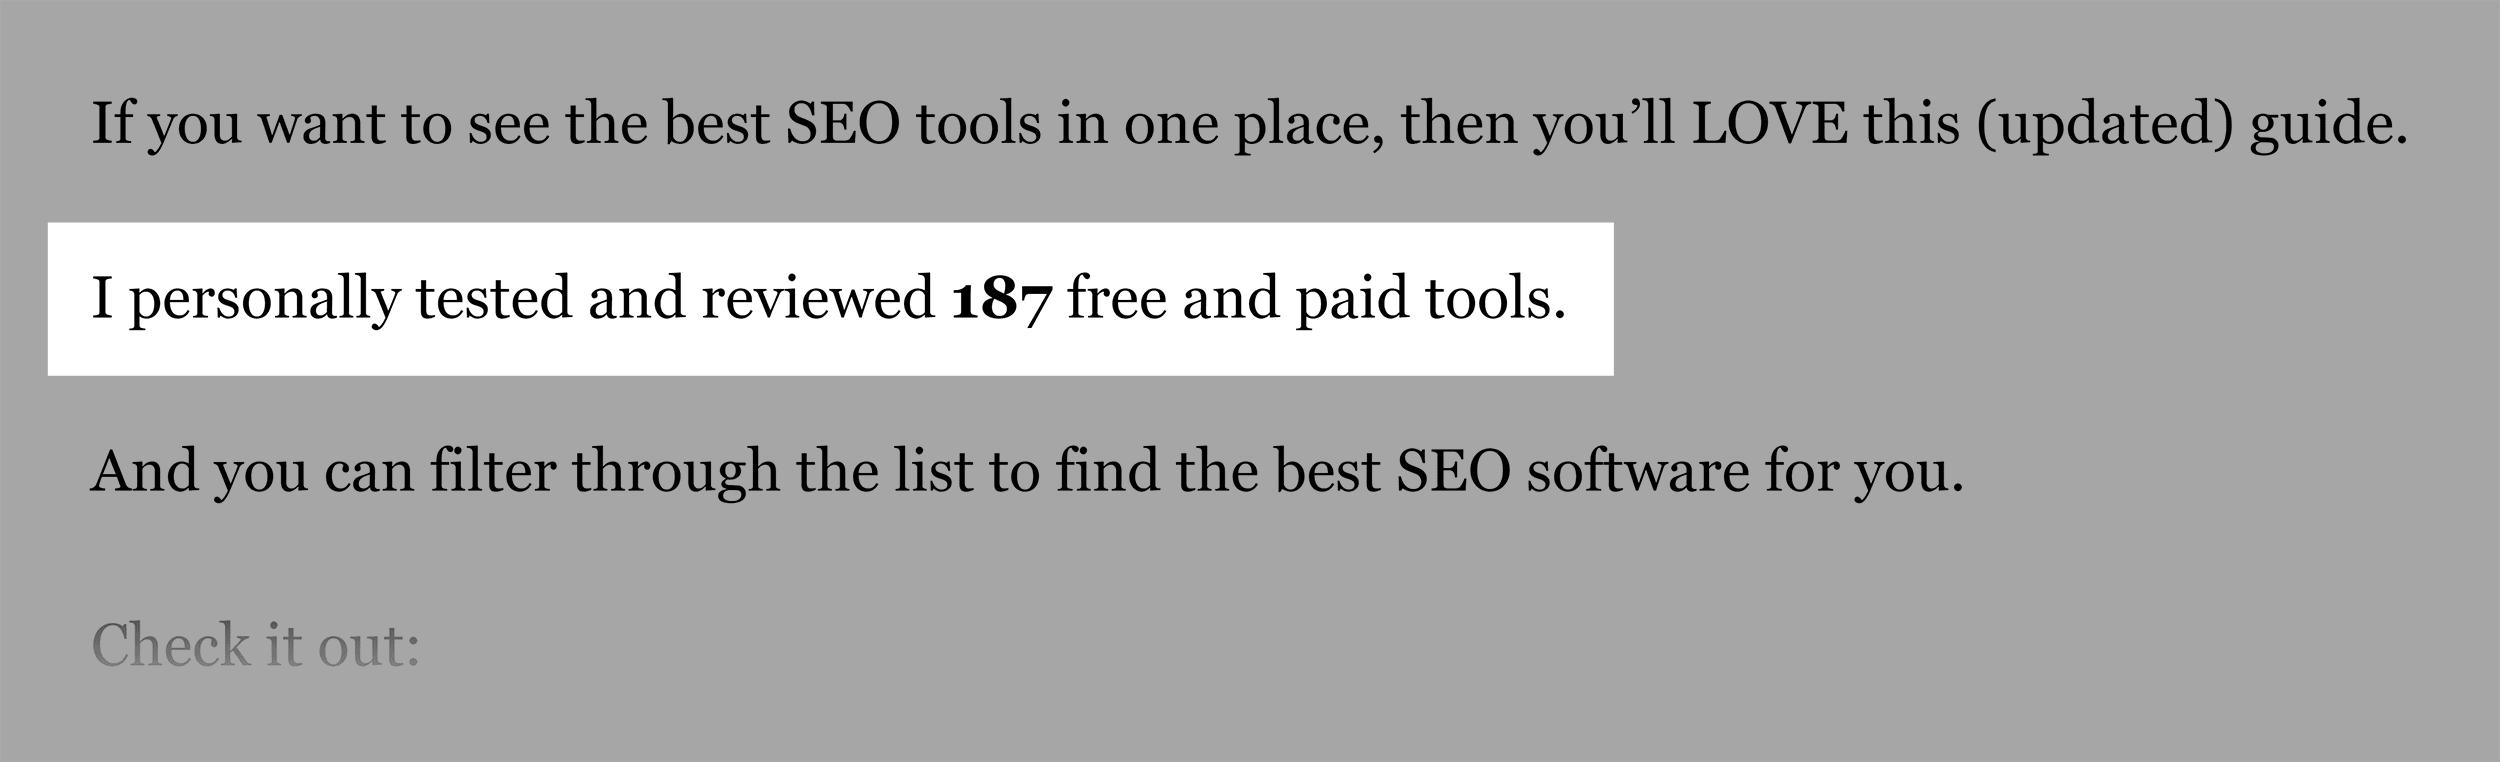 SEO Tools Post Number Of Tools